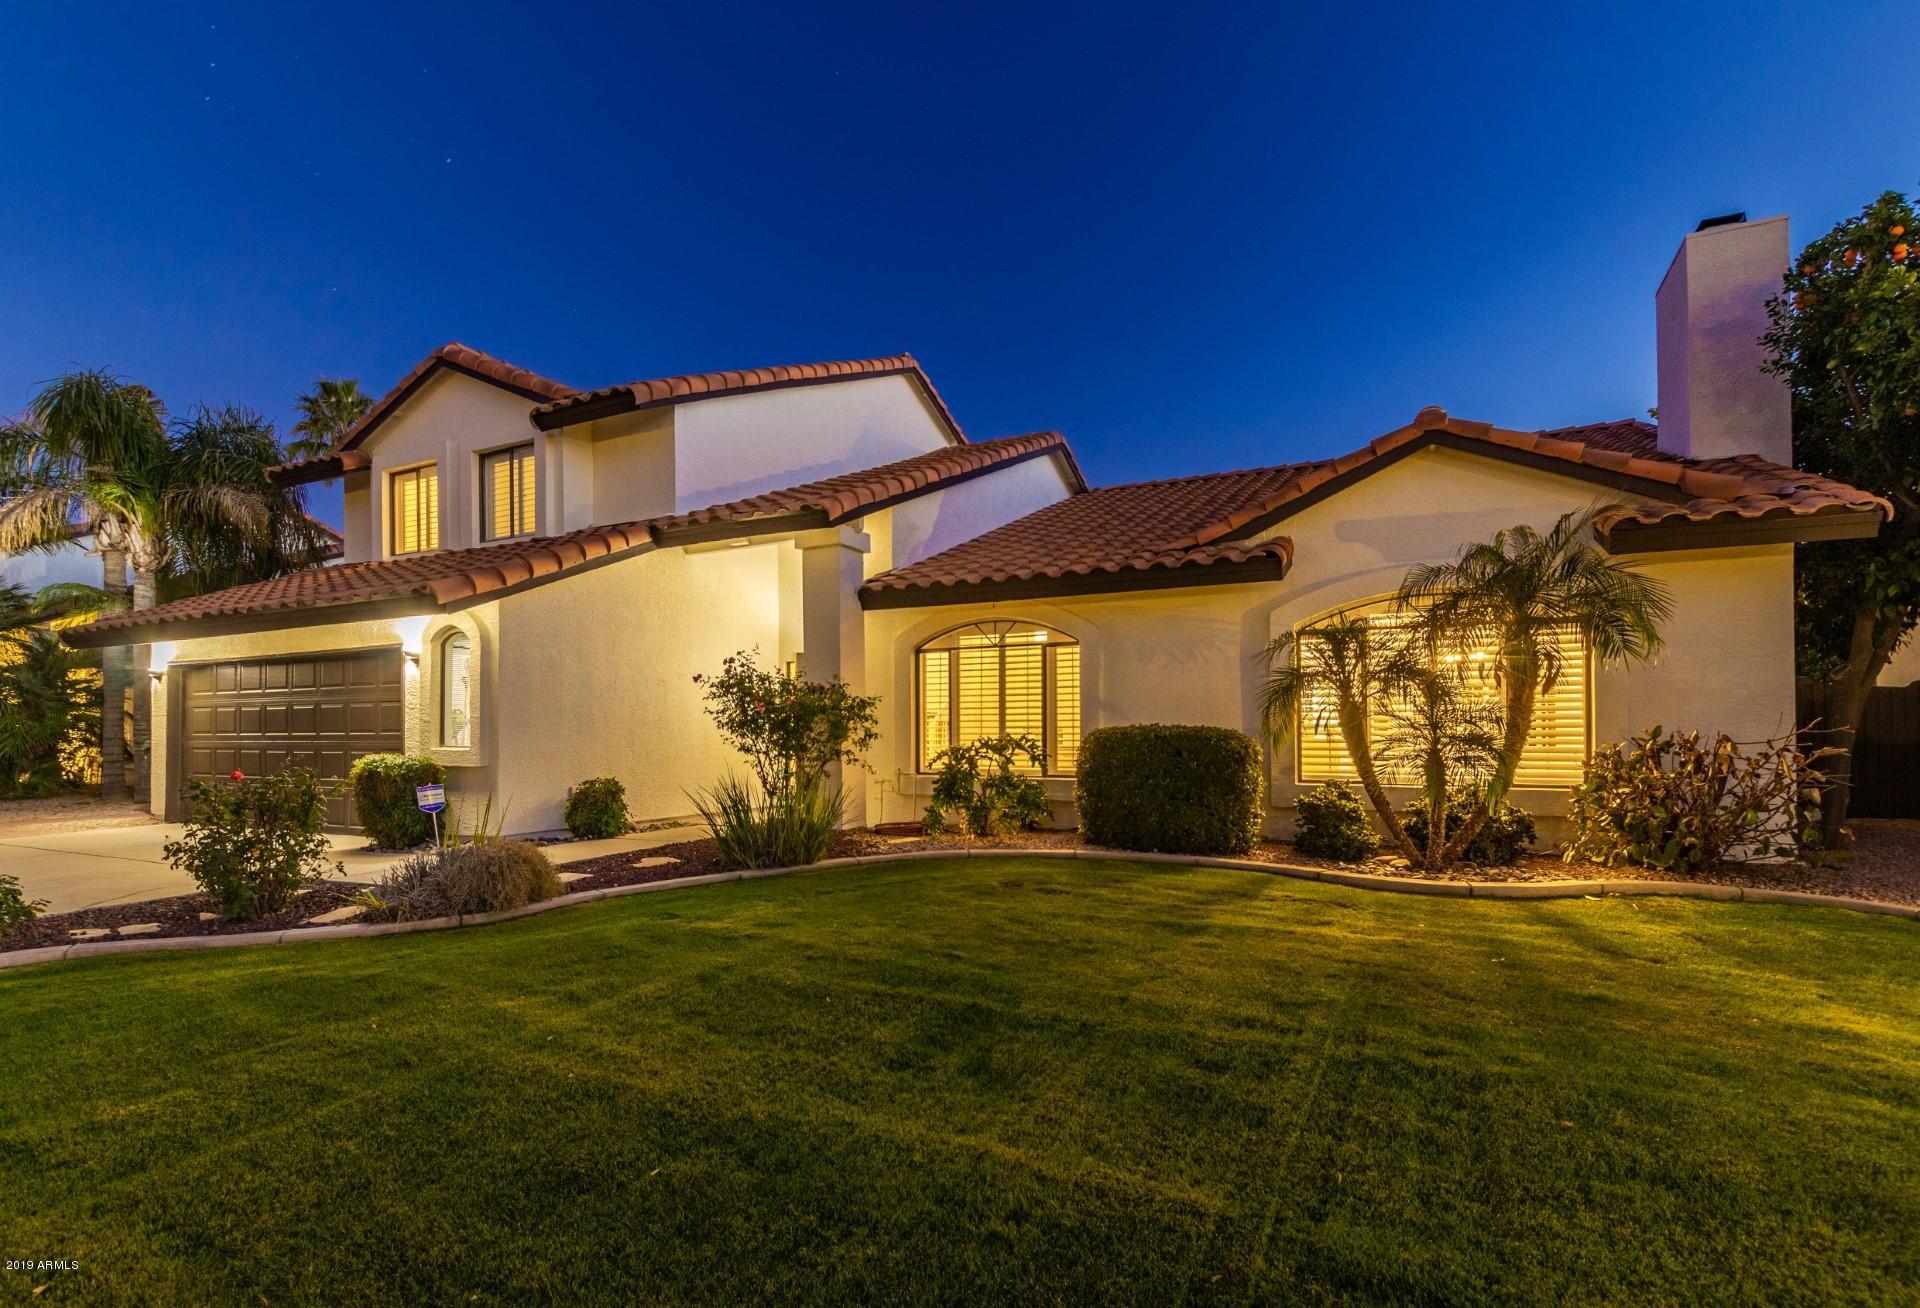 Photo of 5861 E LE MARCHE Avenue, Scottsdale, AZ 85254